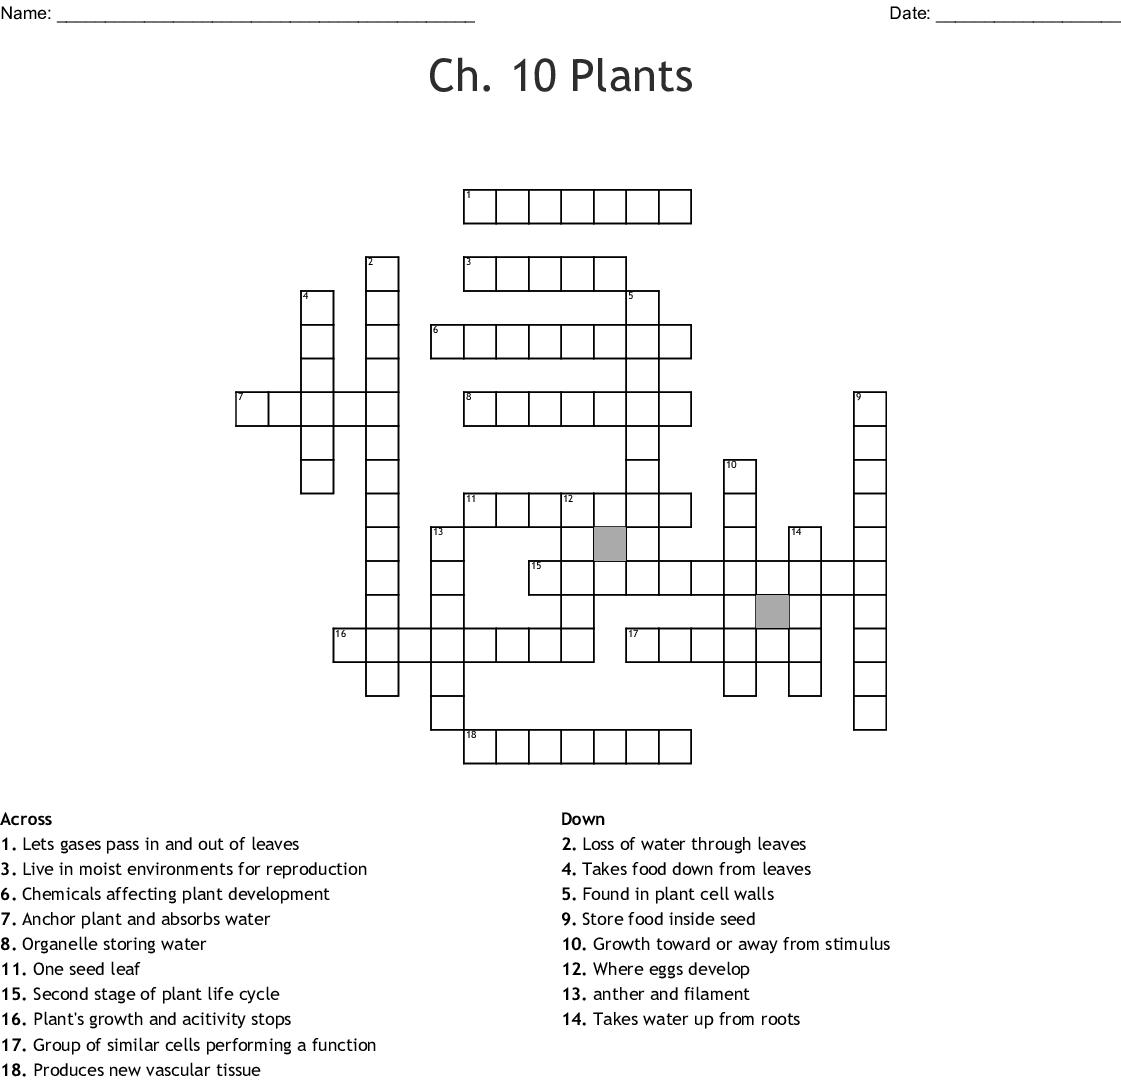 Ch 10 Plants Crossword